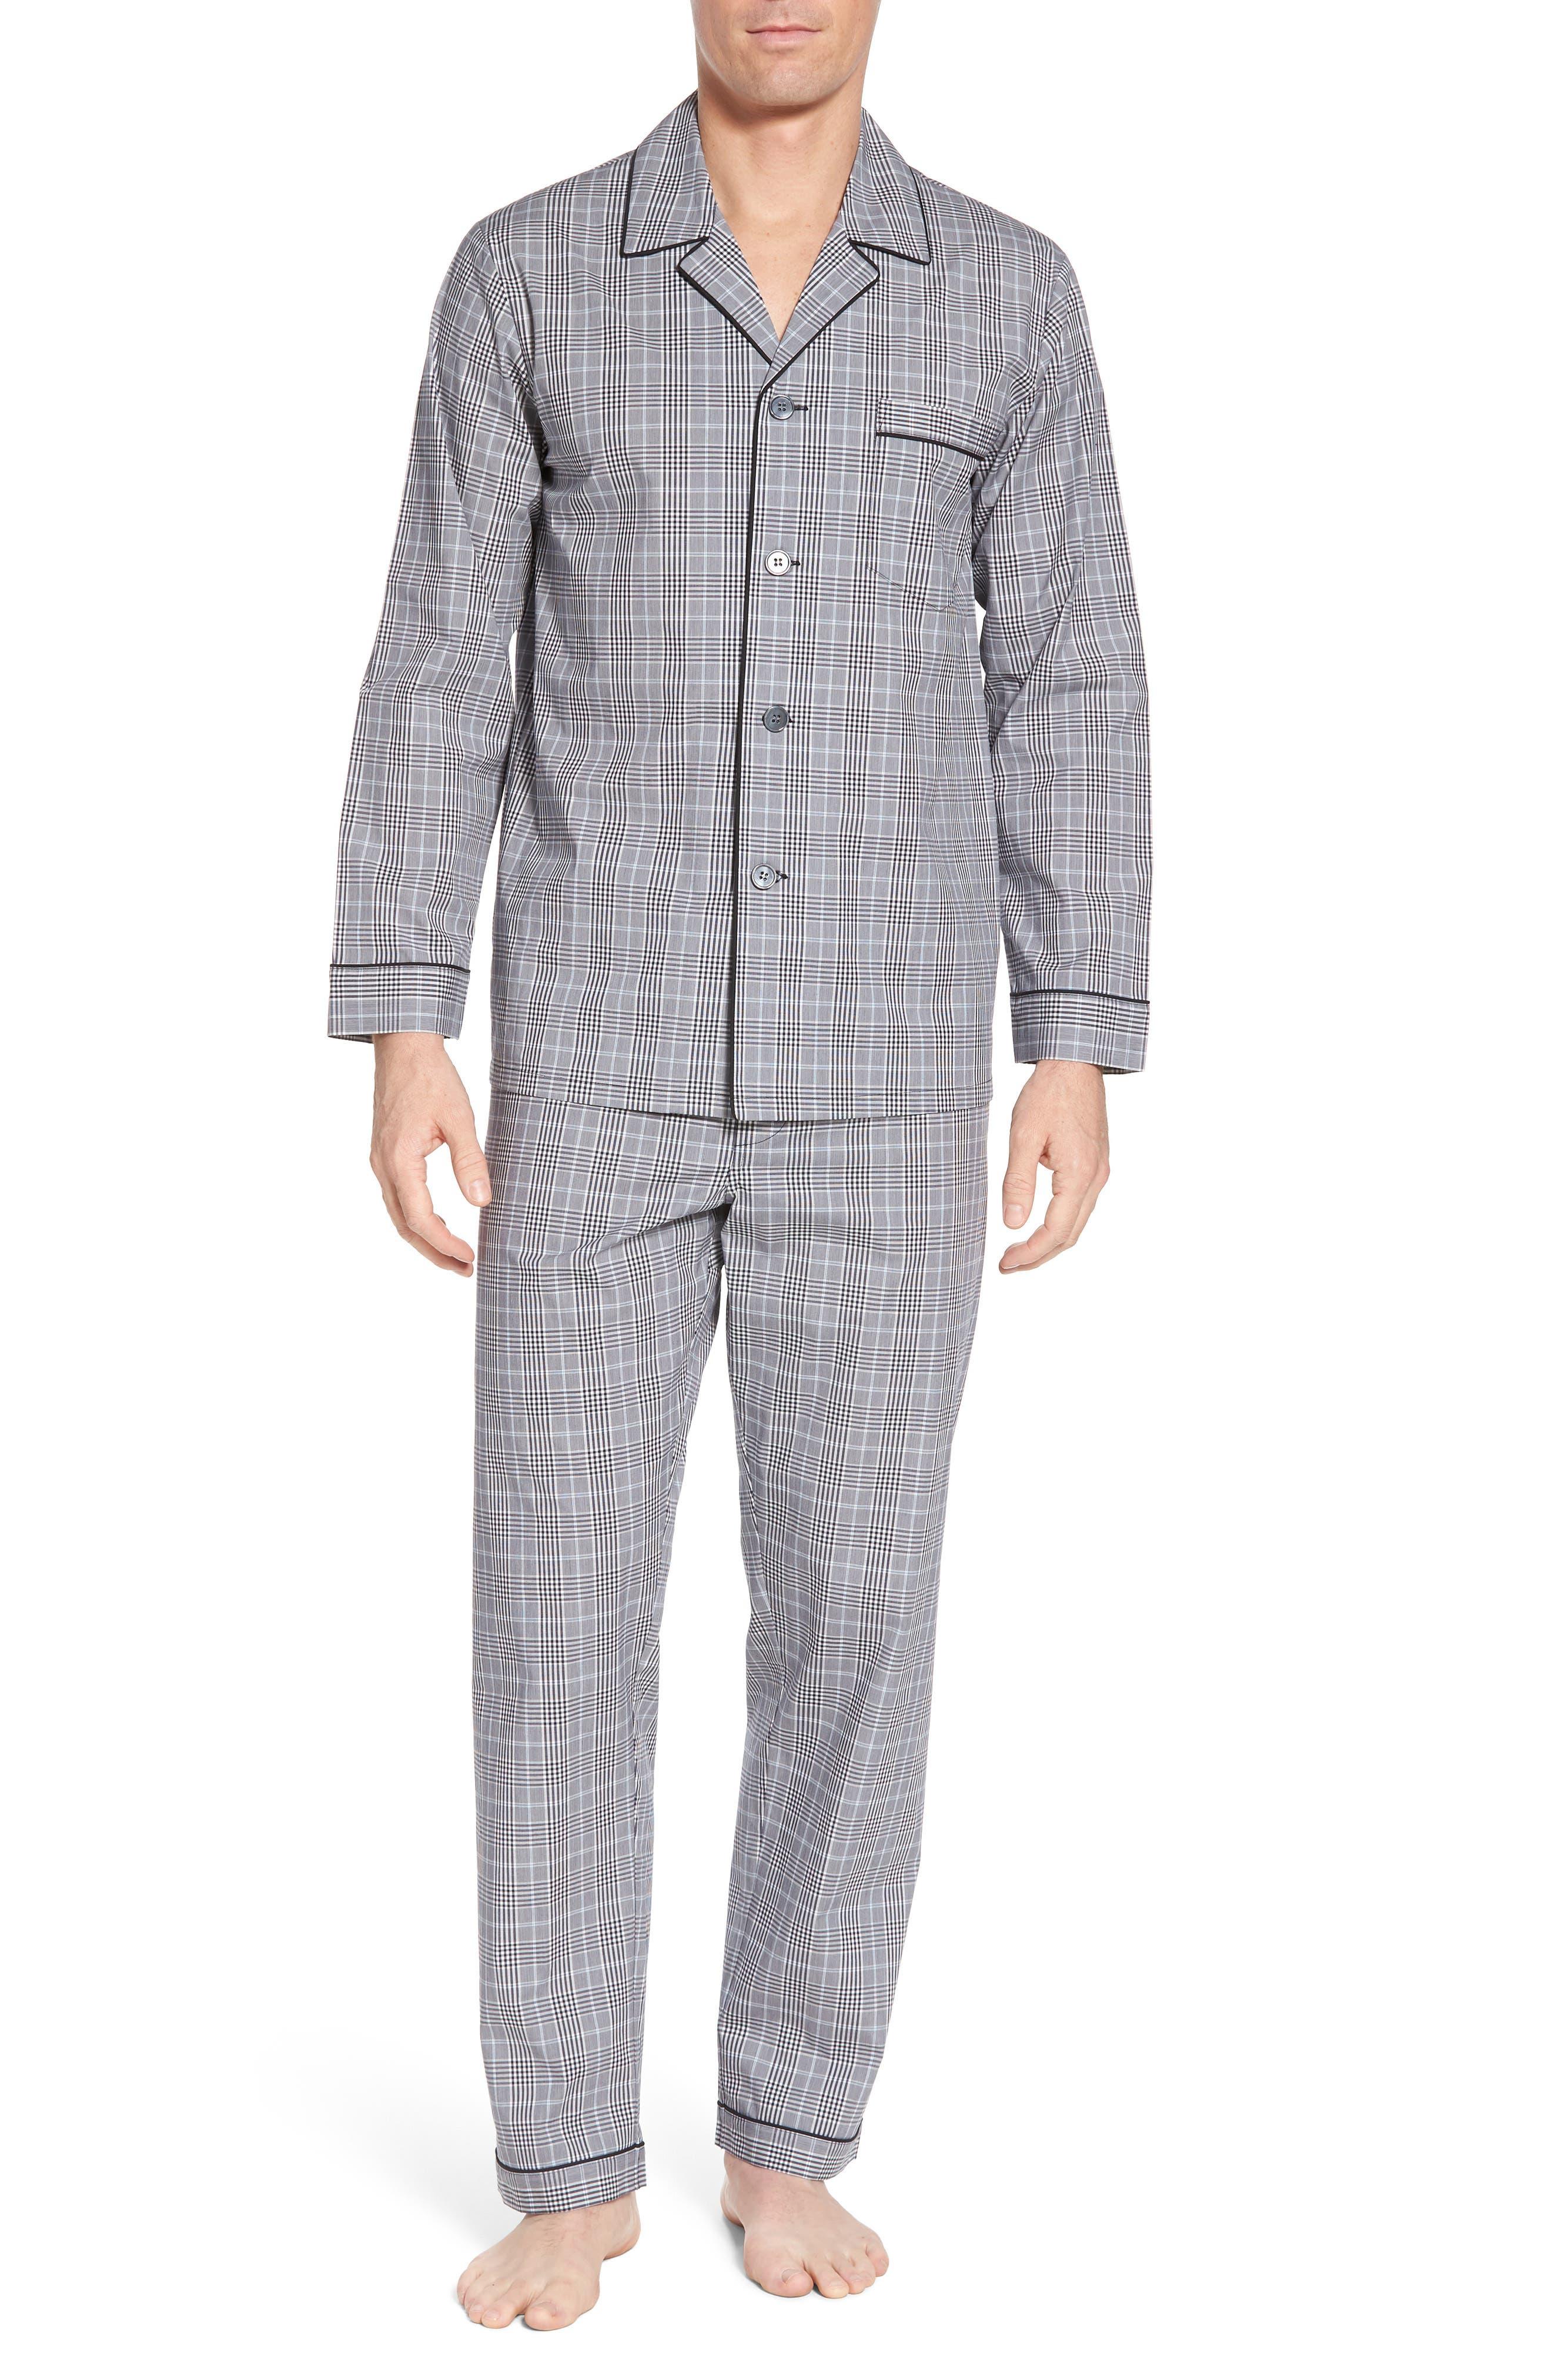 Charleston Pajama Set,                         Main,                         color, Black Plaid